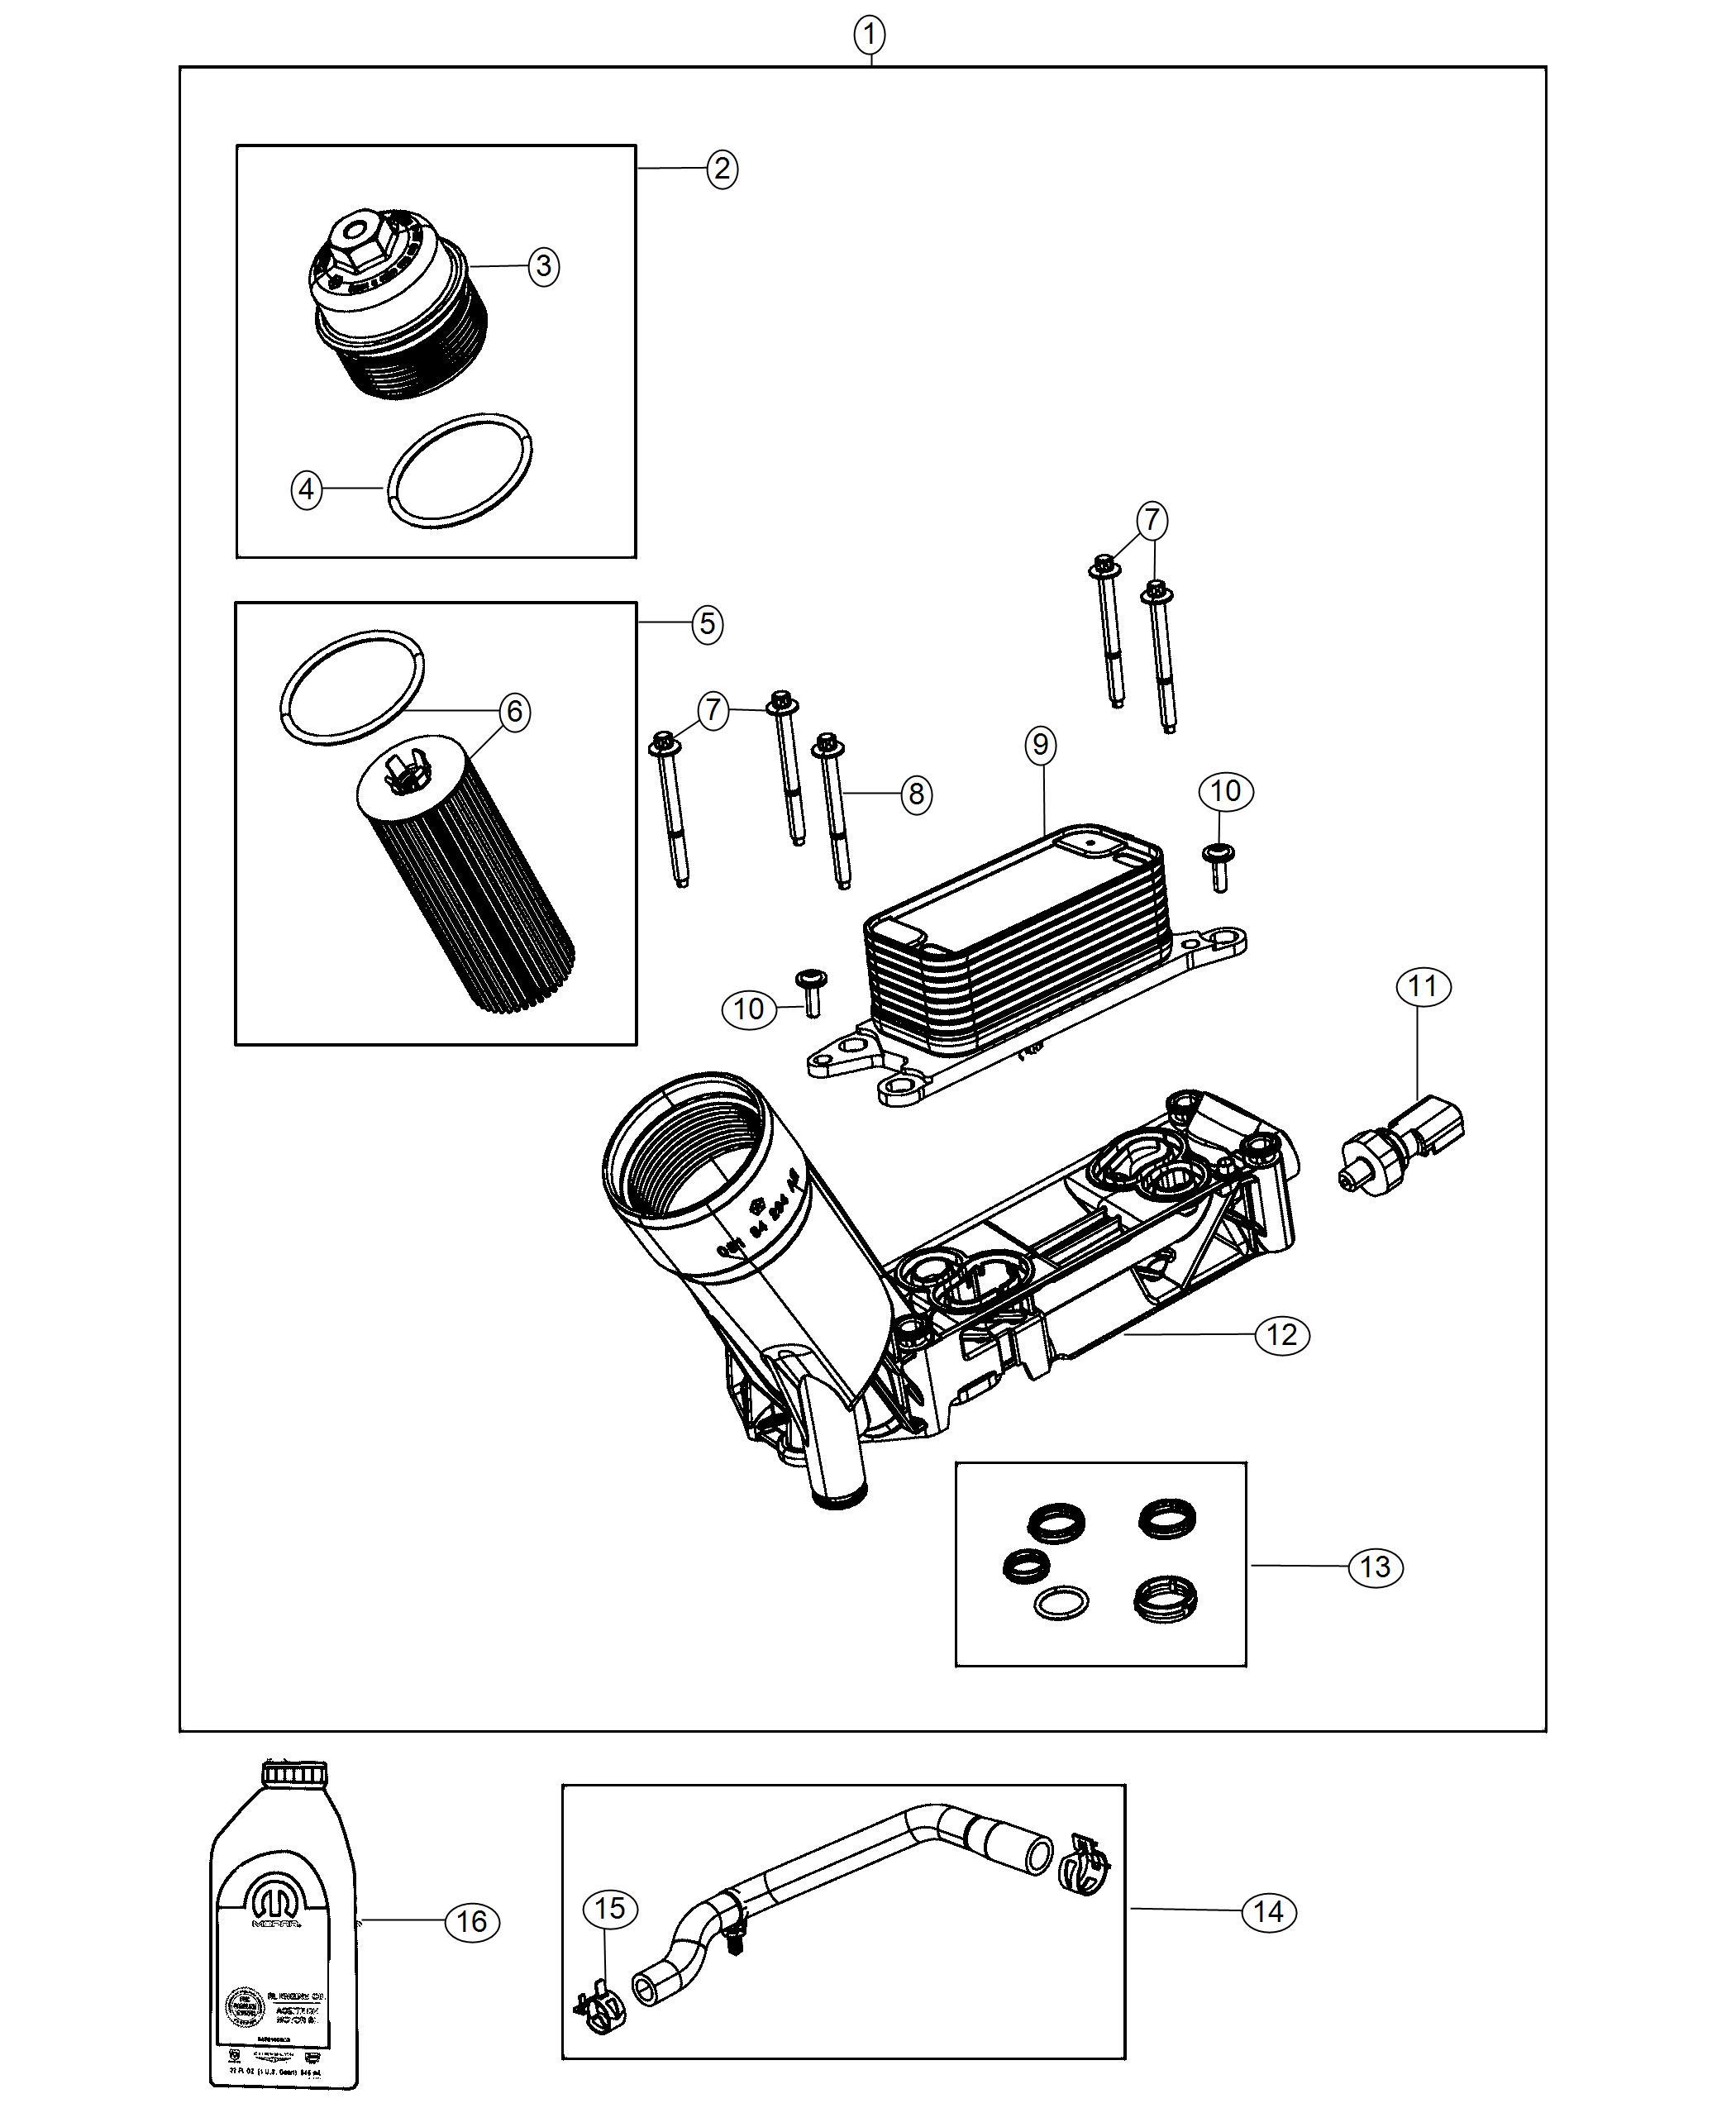 Infamous 3 6 Pentastar Oil Cooler Strikes